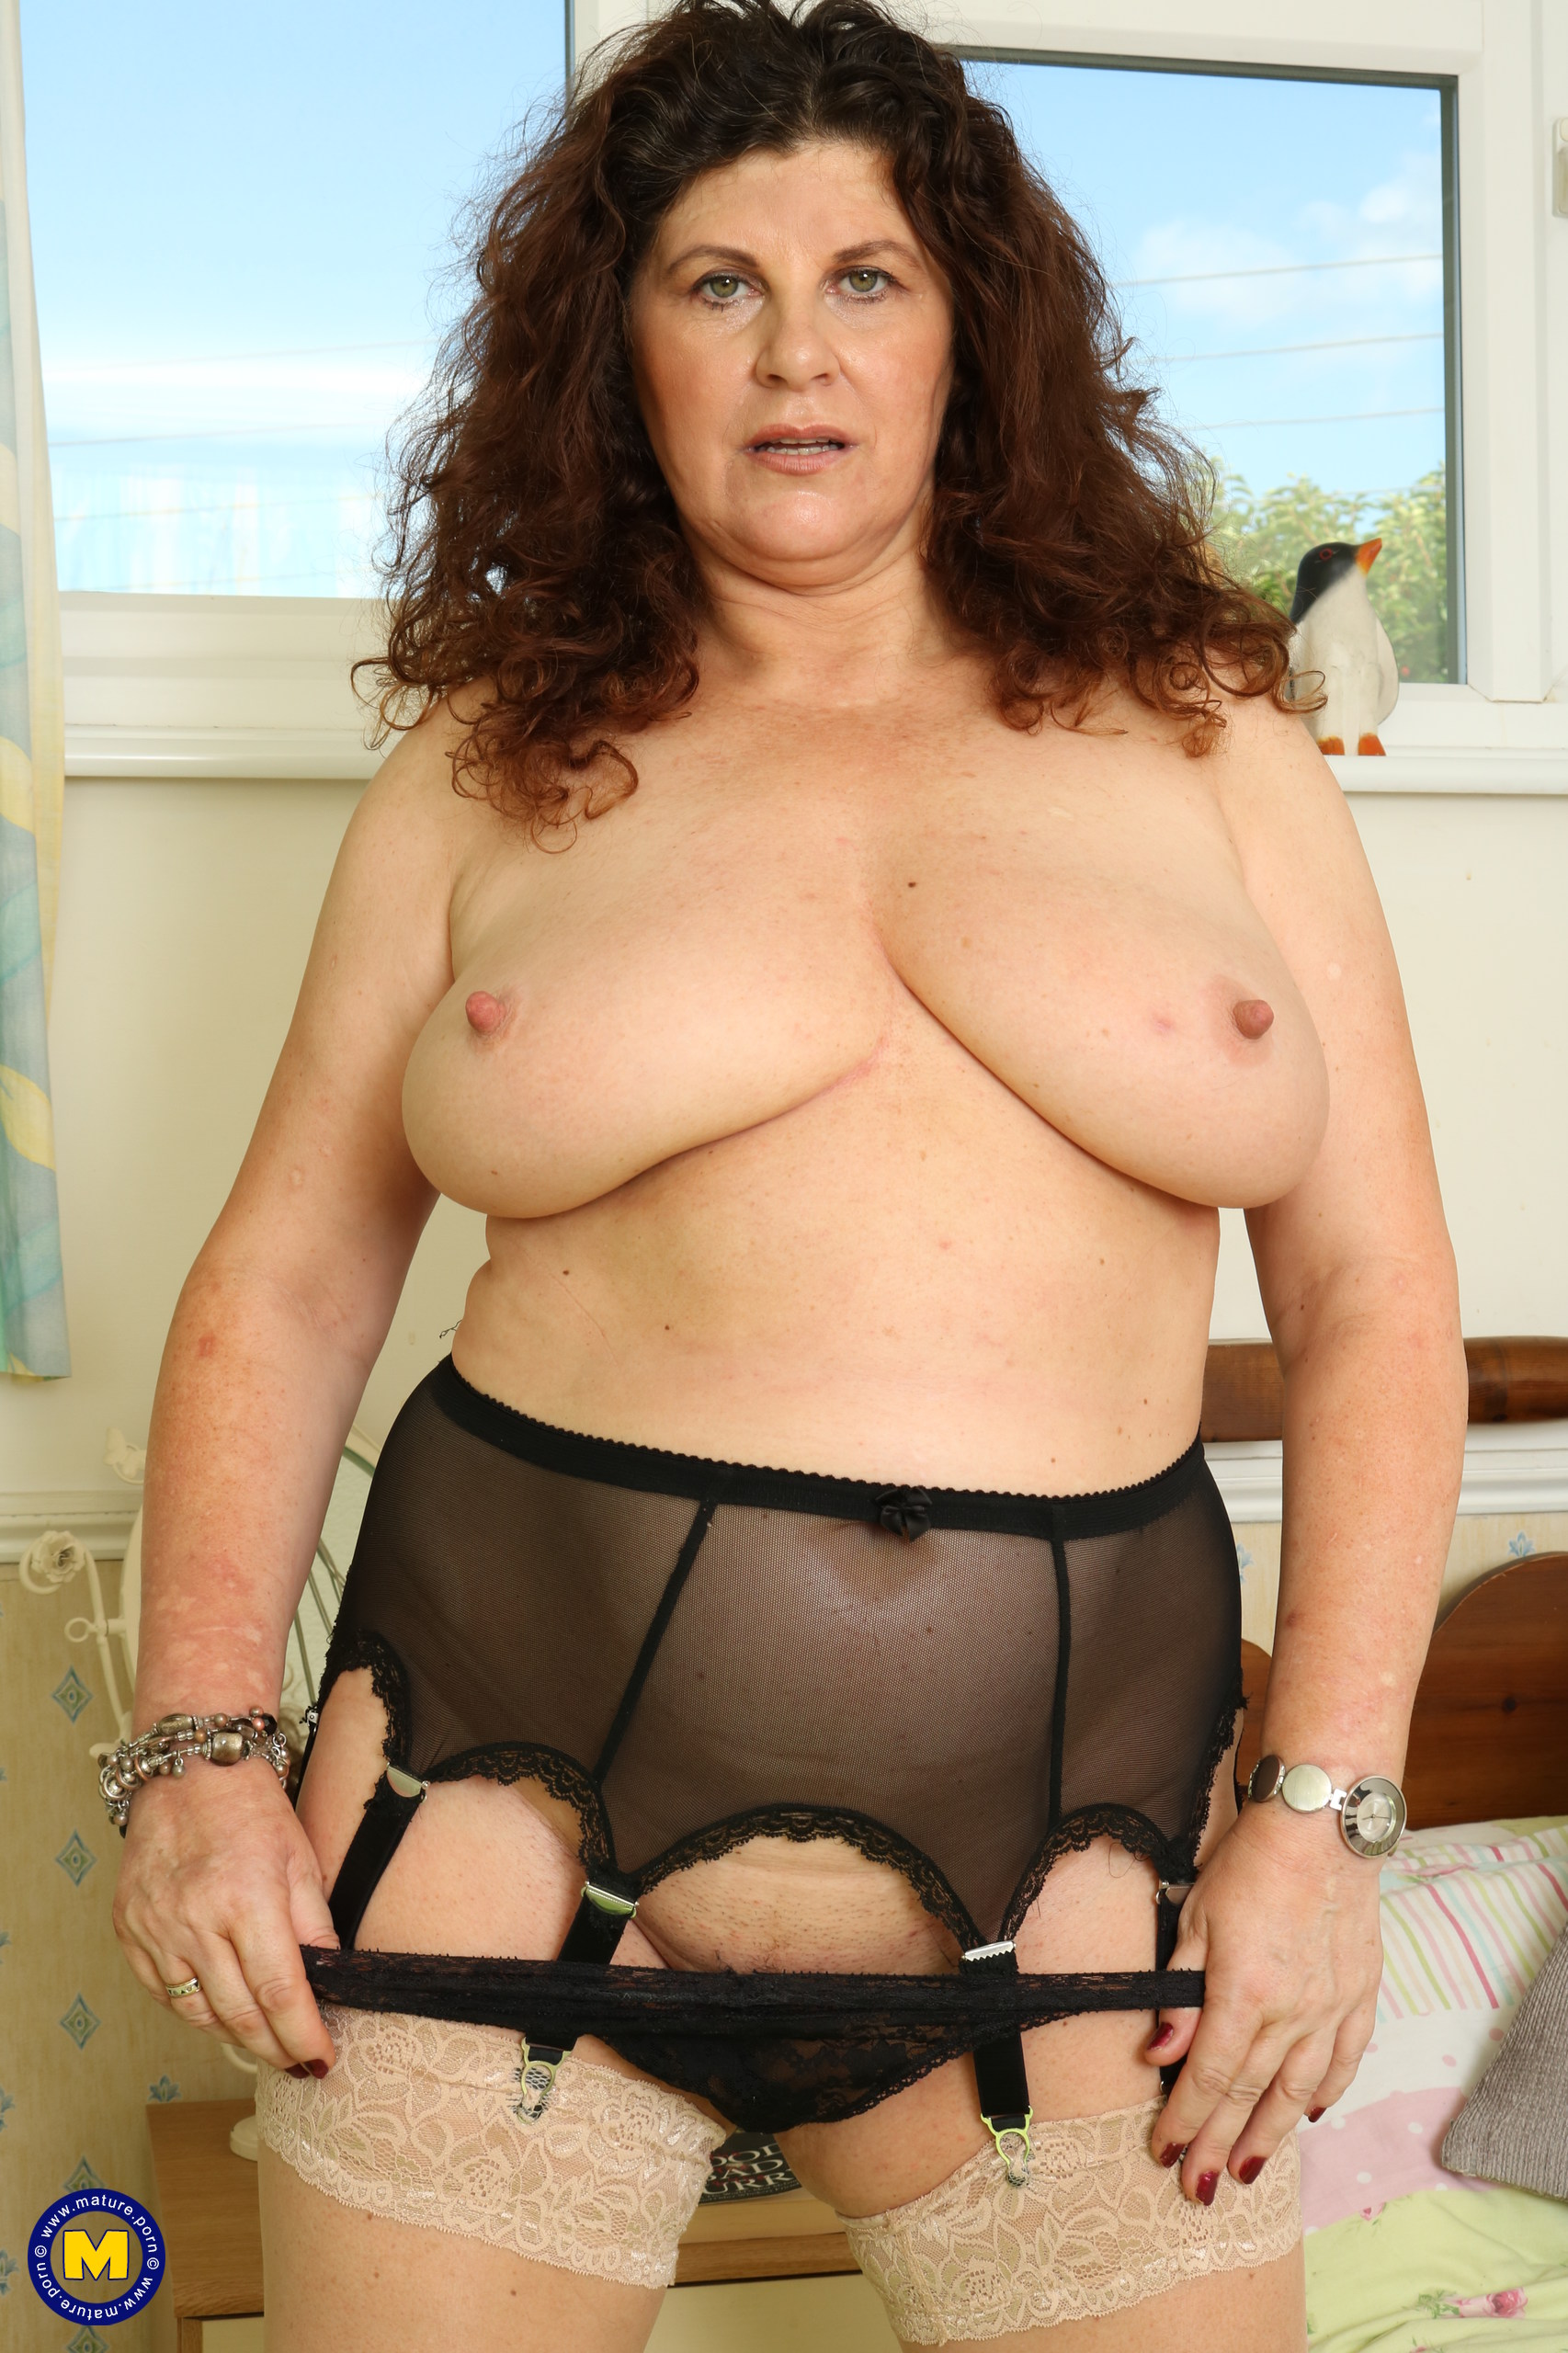 Curvy hefty jugged Brit housewife finger-tickling herself